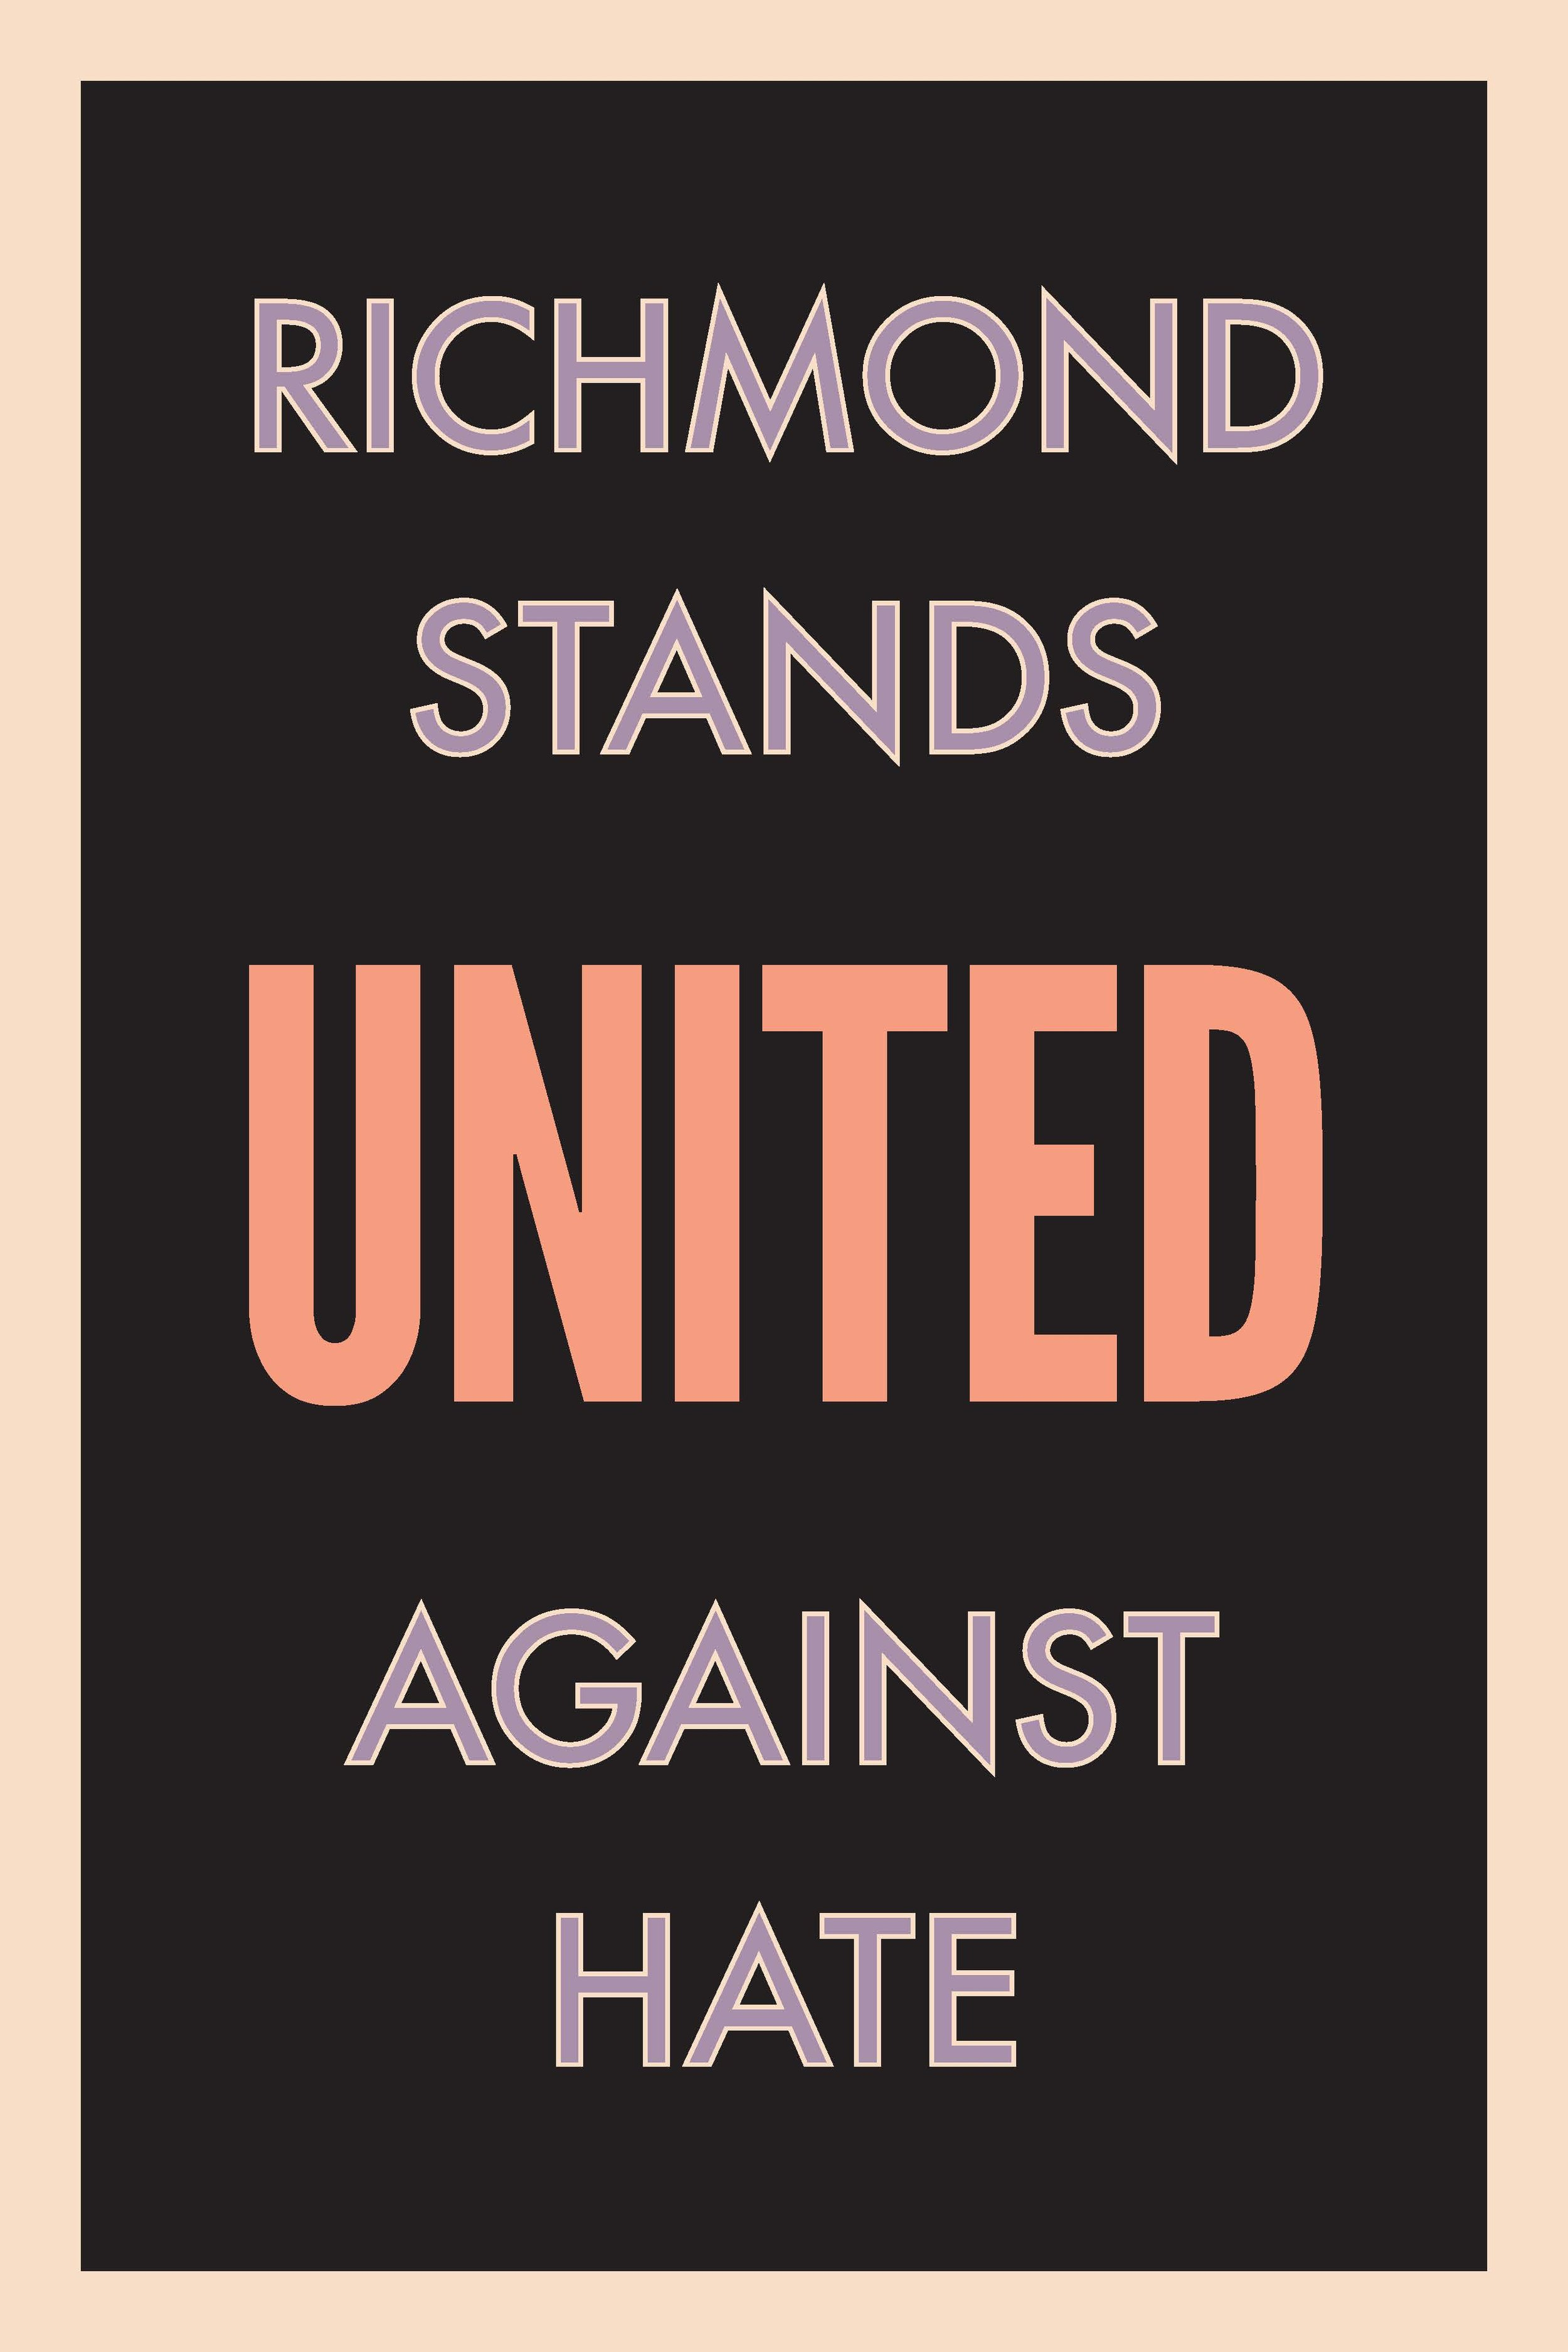 RichmondUnited_19x12.5.jpg